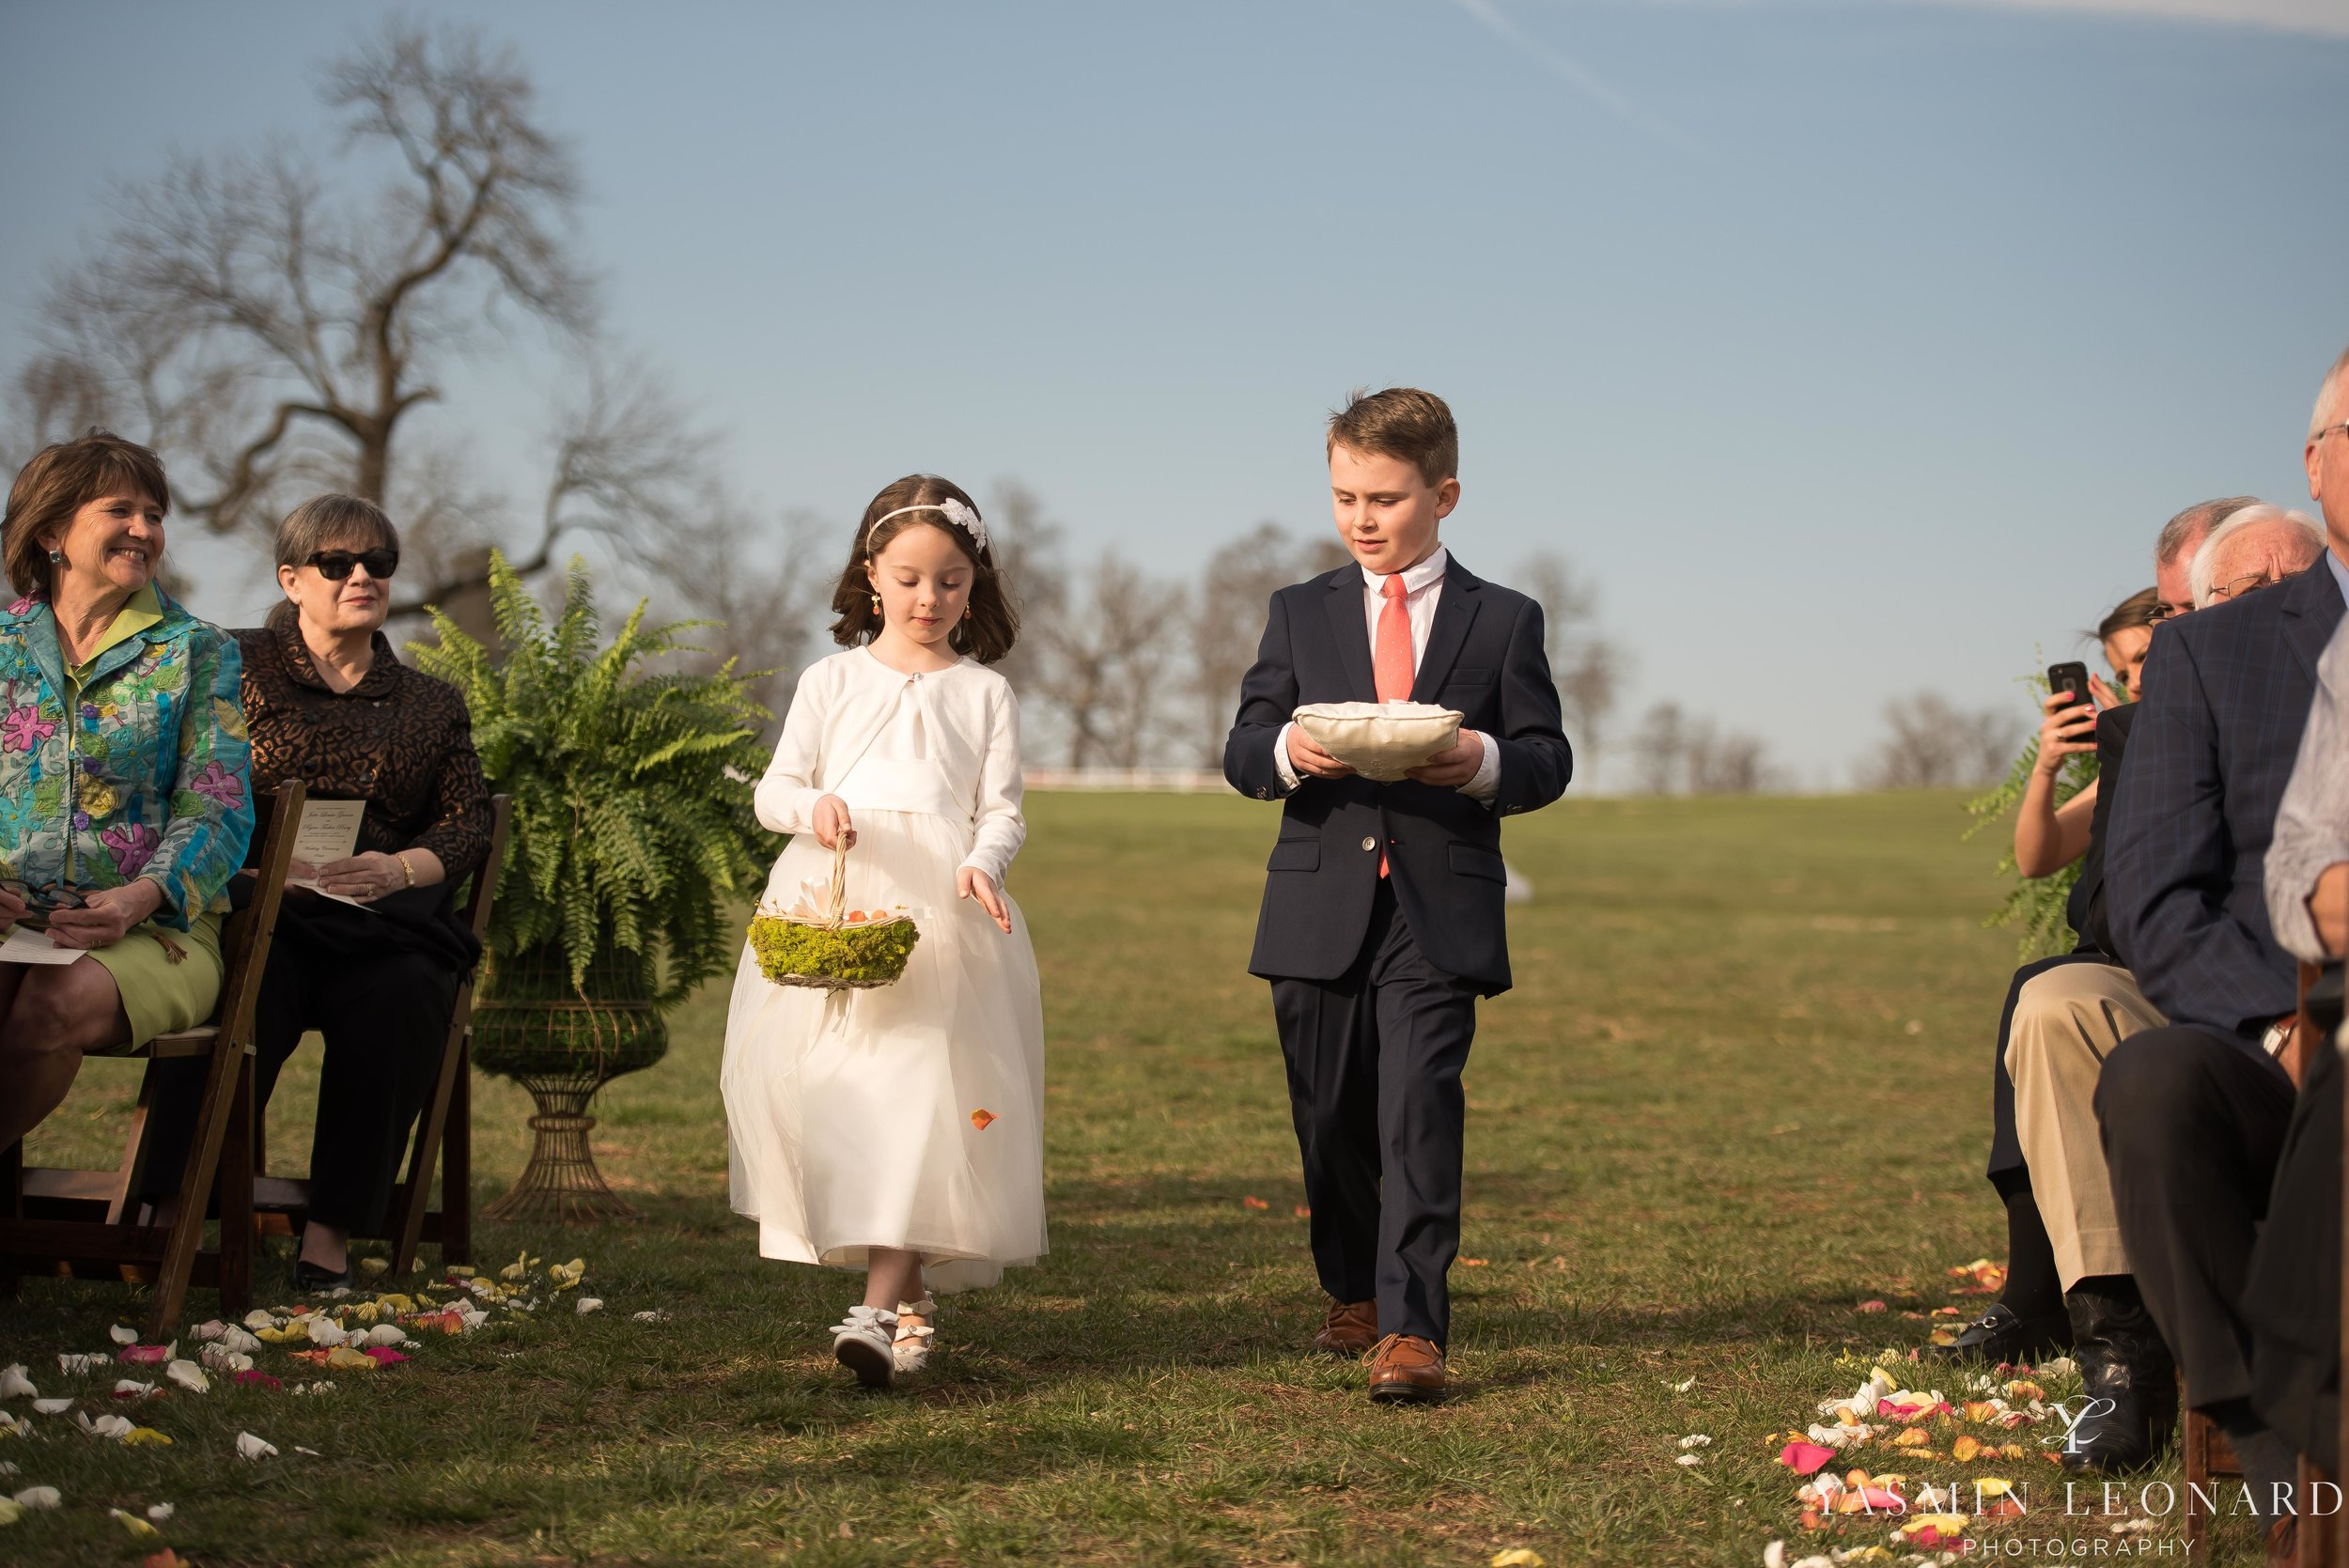 Adaumont Farm - Adaumont Farm Weddings - Trinity Weddings - NC Weddings - Yasmin Leonard Photography-25.jpg